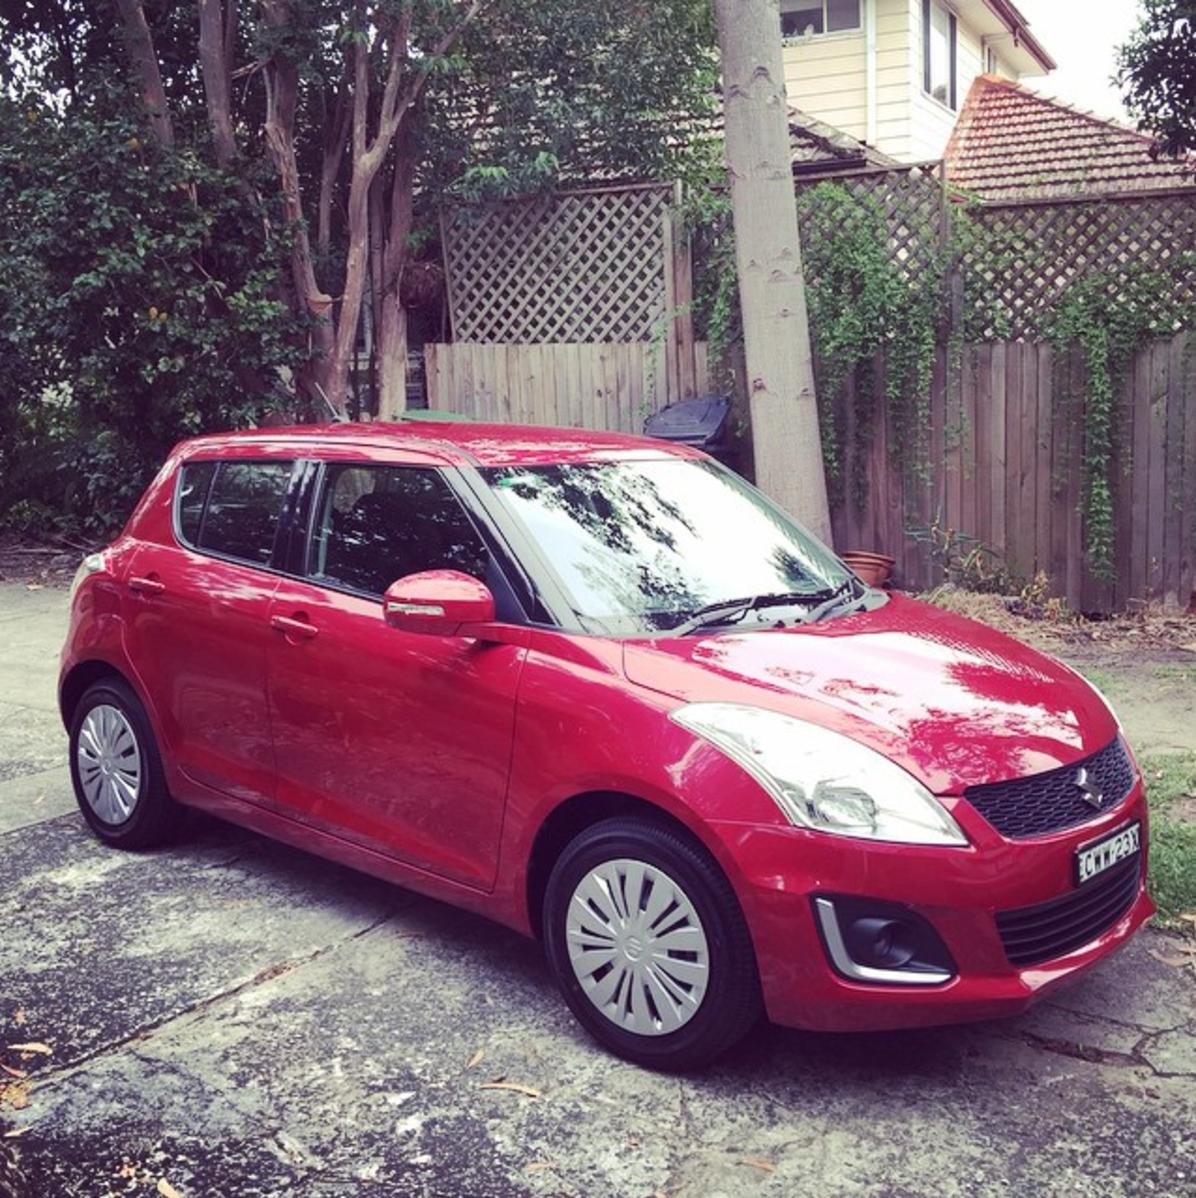 Picture of Rose's 2015 Suzuki Swift